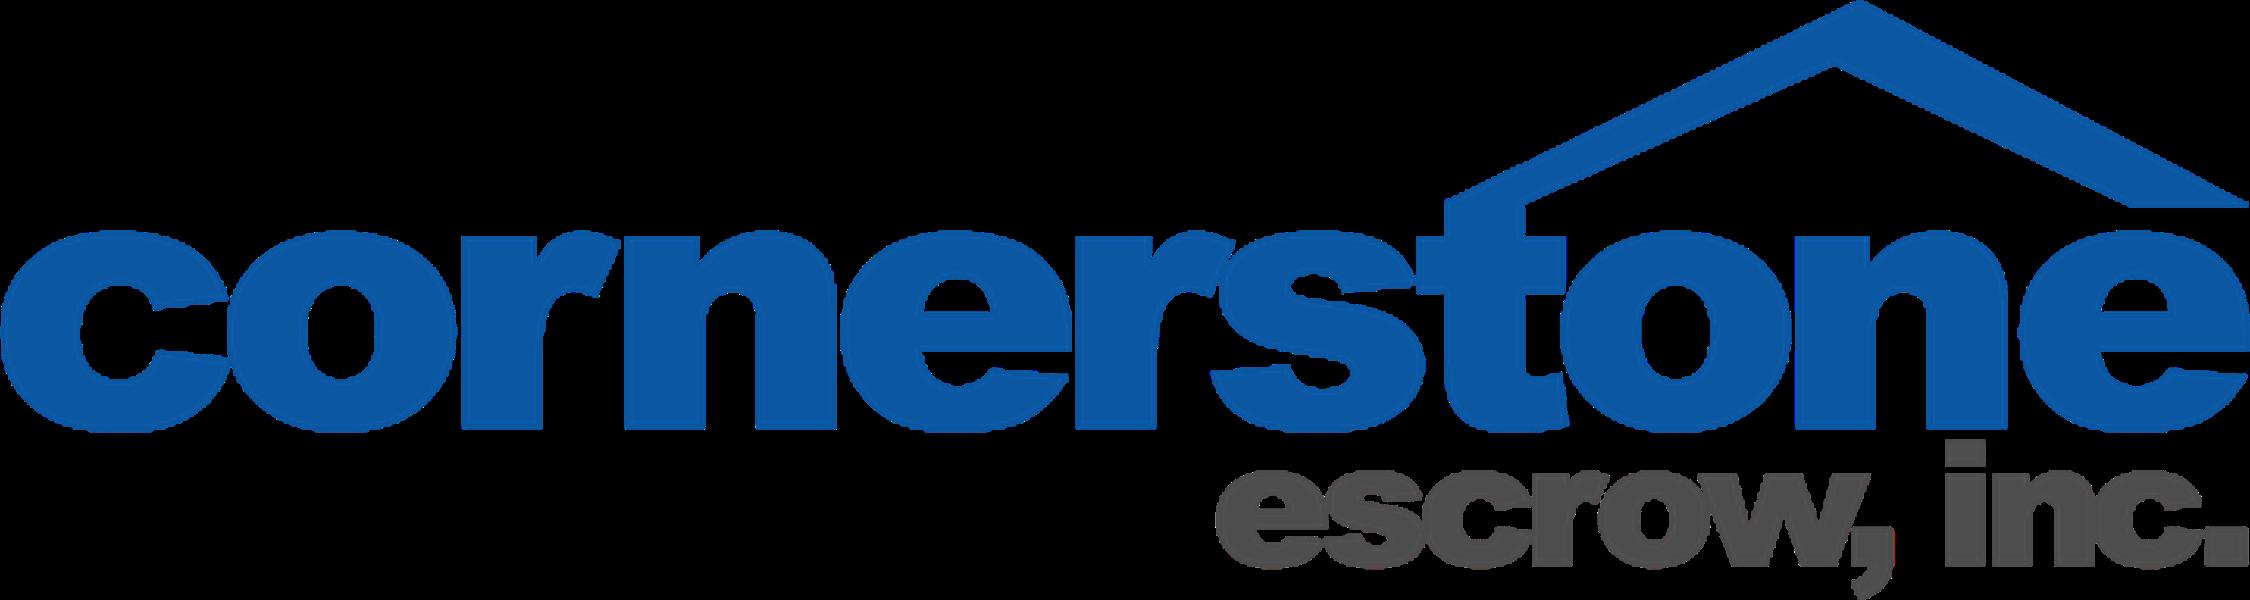 Cornerstone Escrow, Inc.